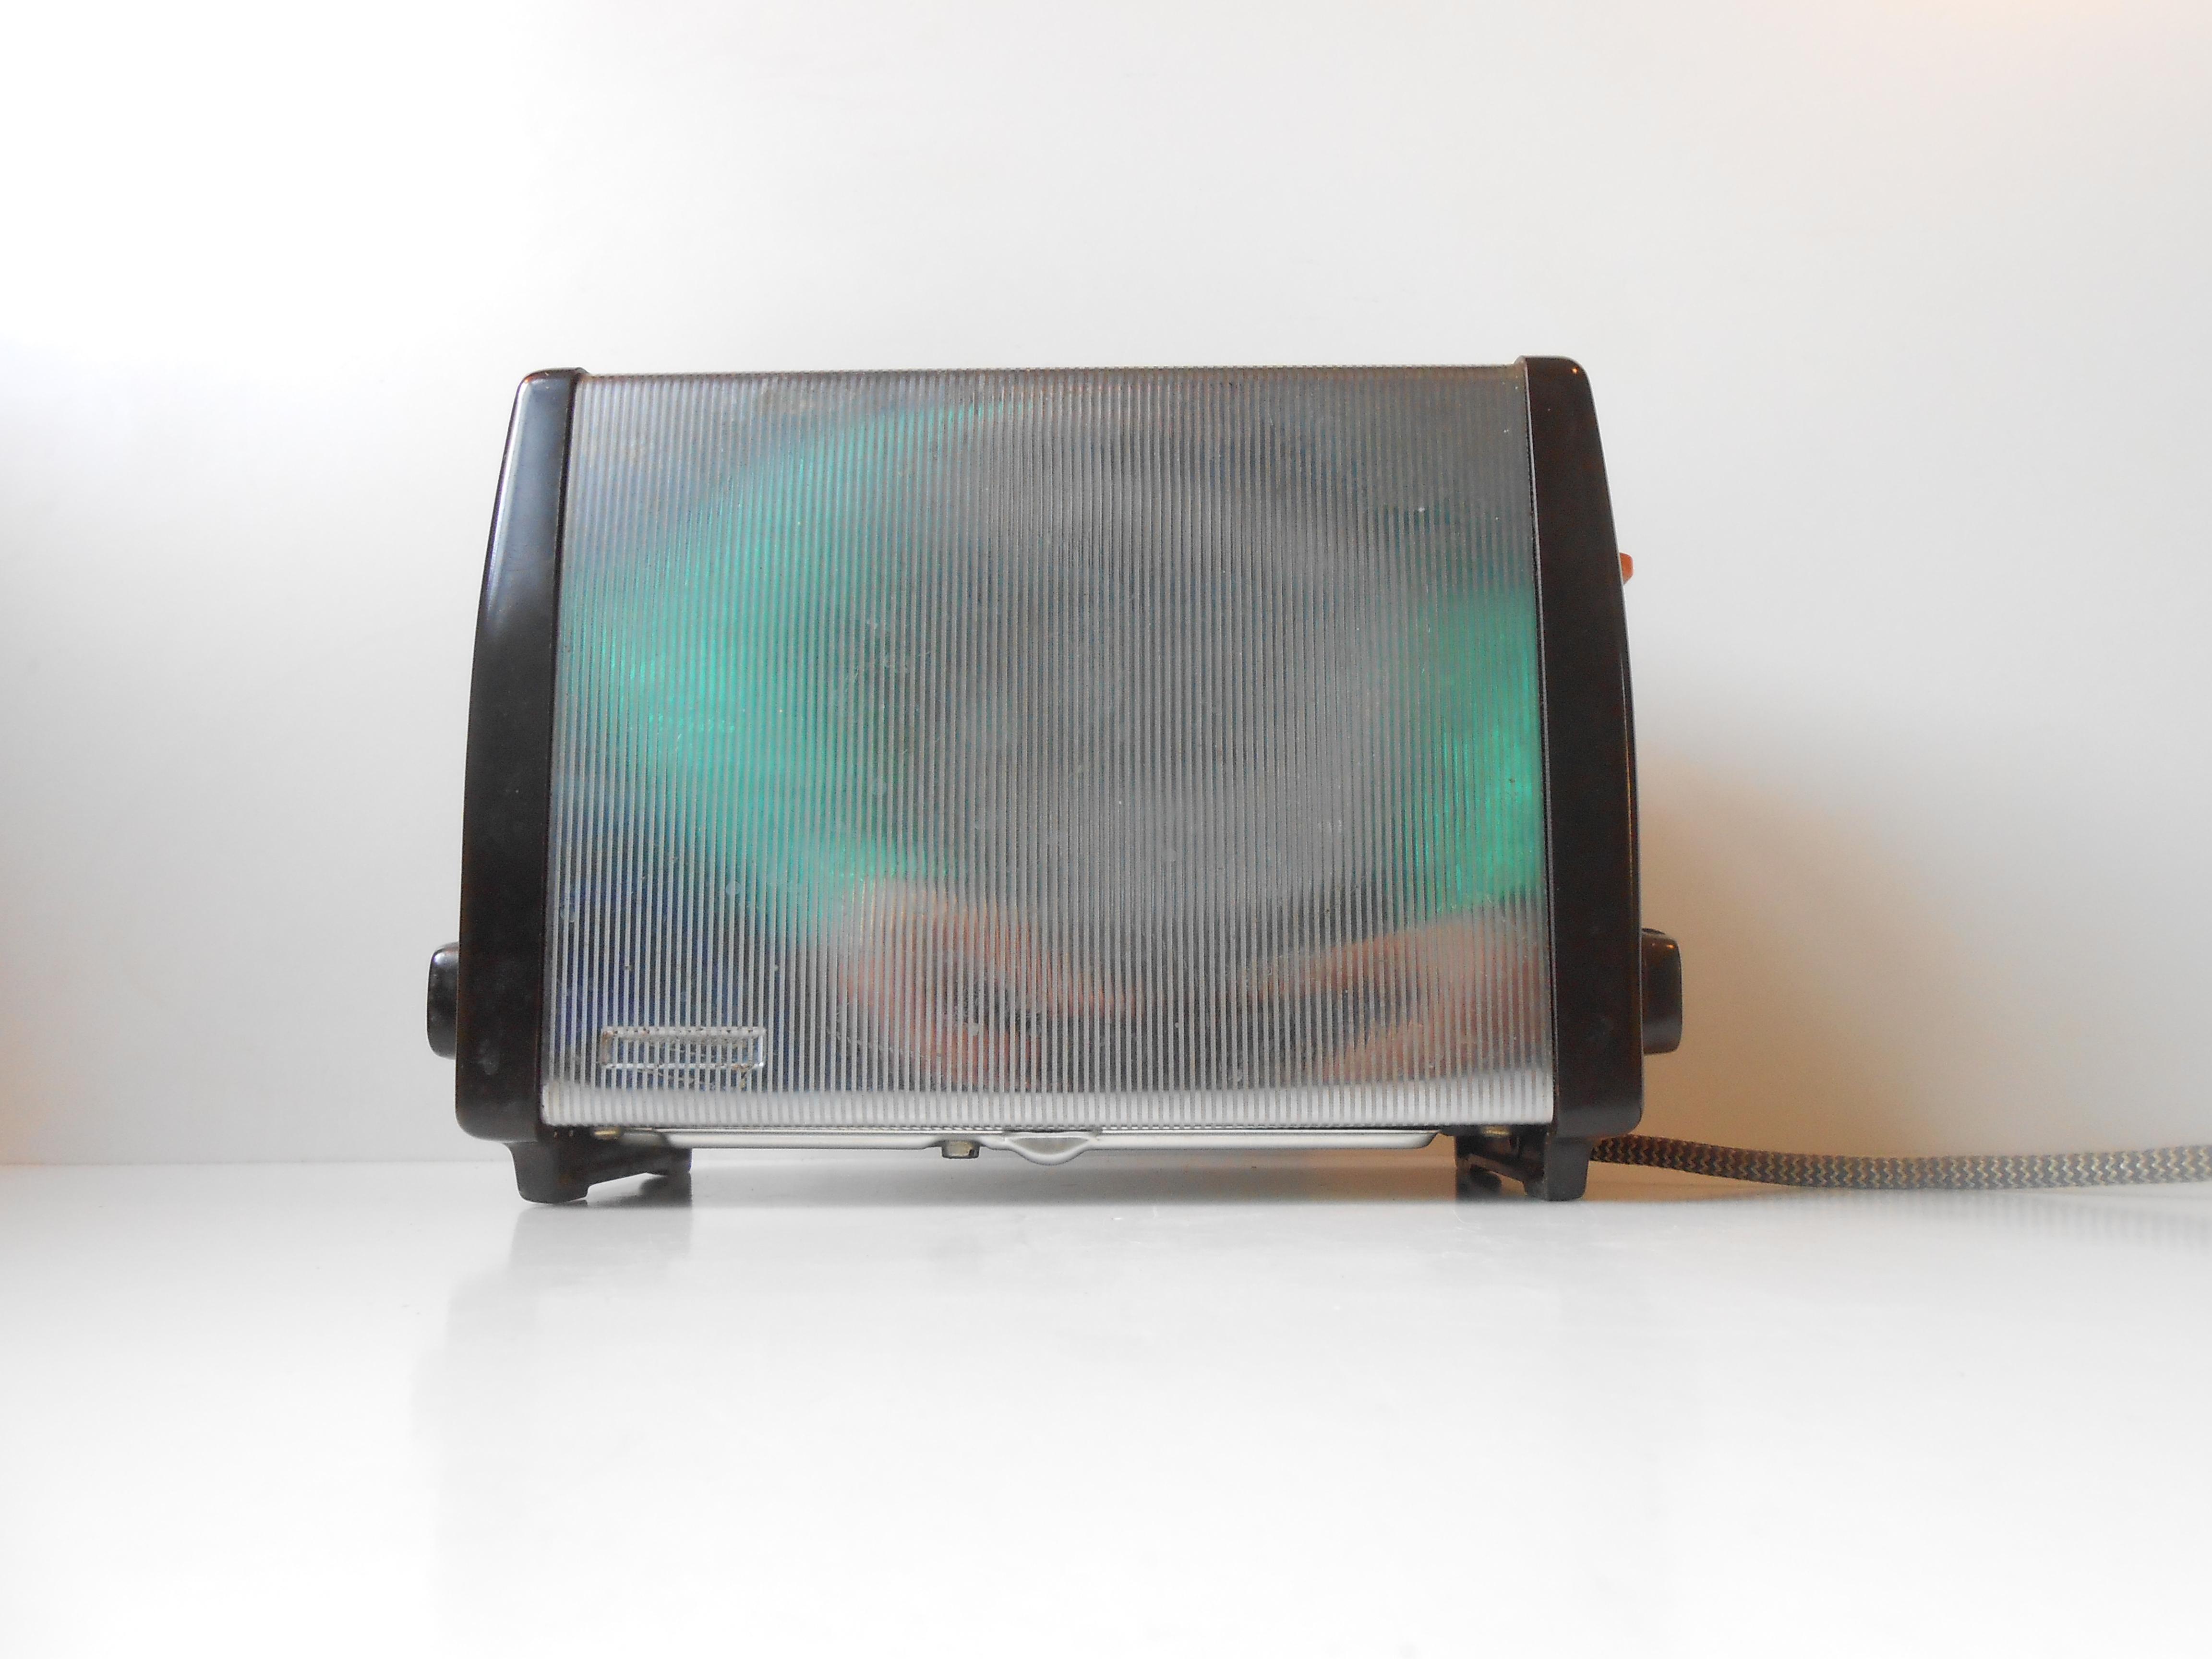 retro toaster philips ca 1970 retro. Black Bedroom Furniture Sets. Home Design Ideas